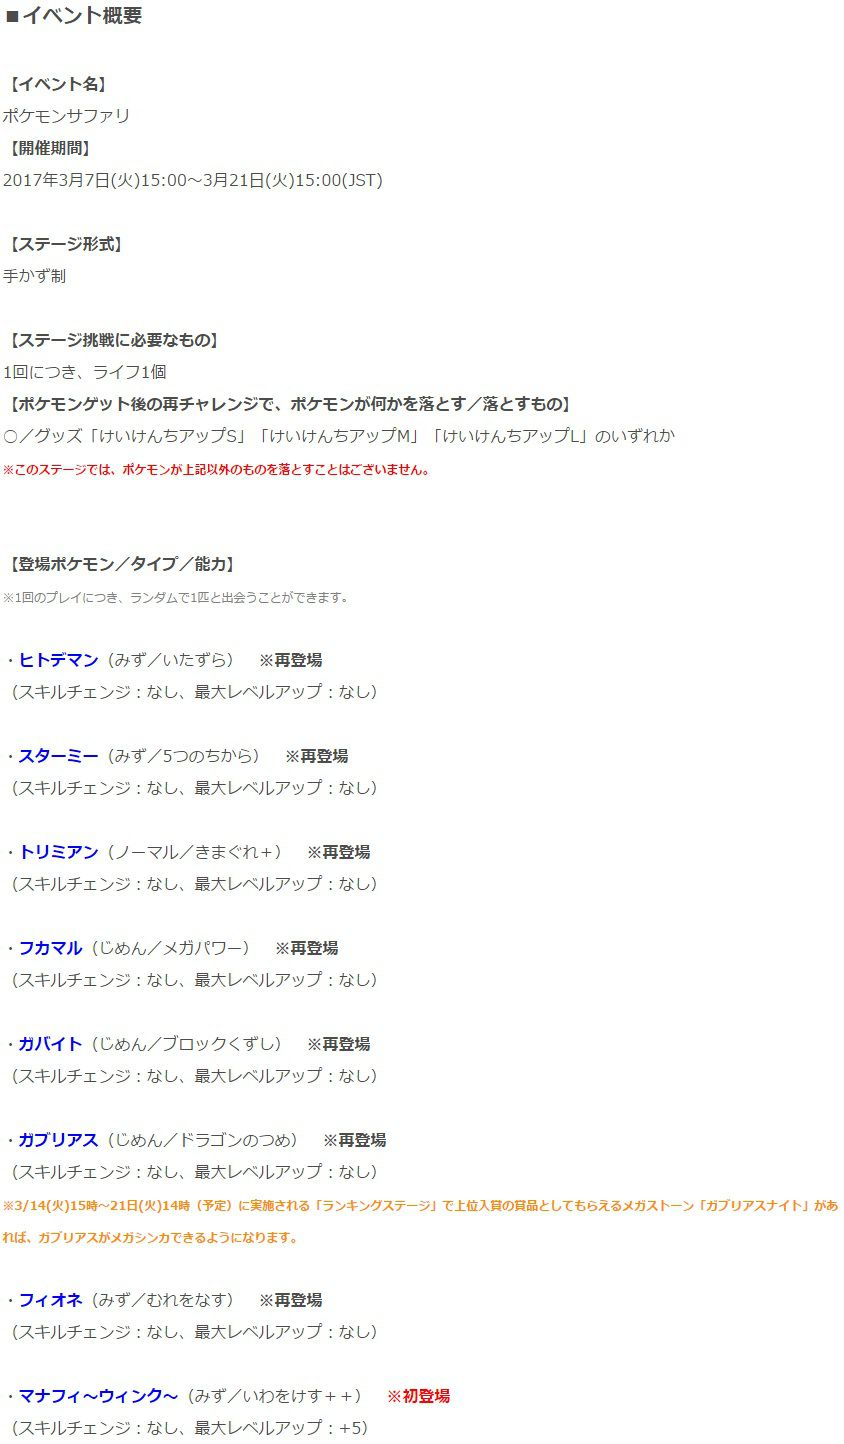 image_8362.jpg